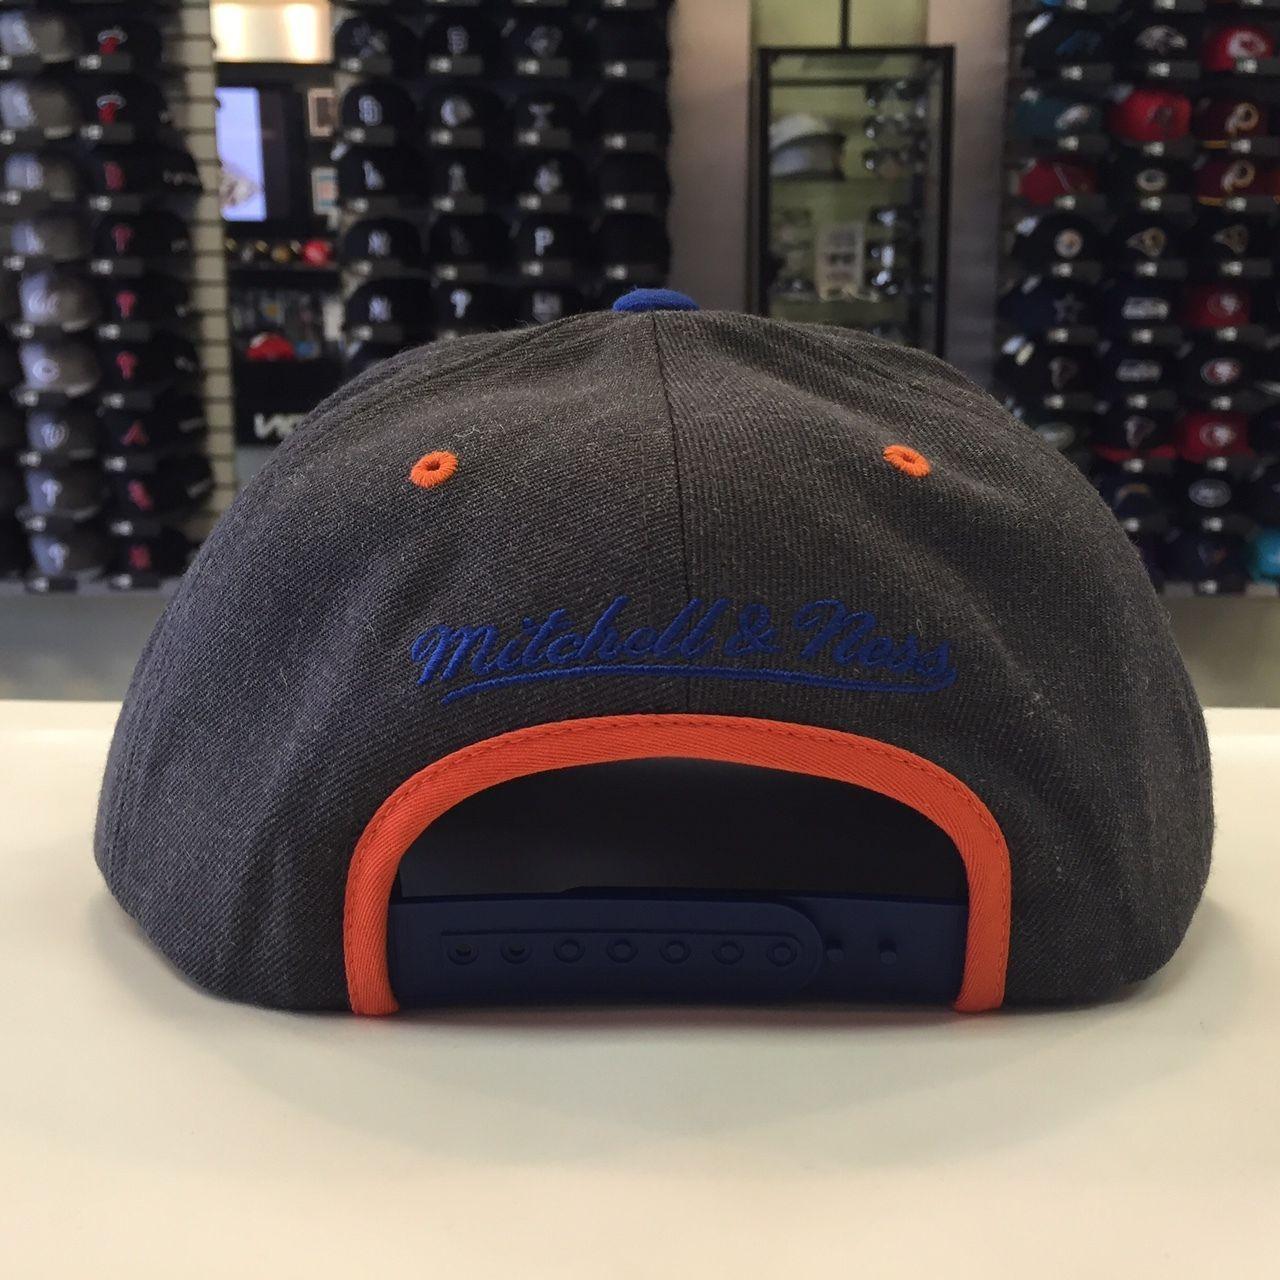 Mitchell & Ness NBA New York Knicks  Dark Heather Charcoal Snpabck Cap Hat 12746